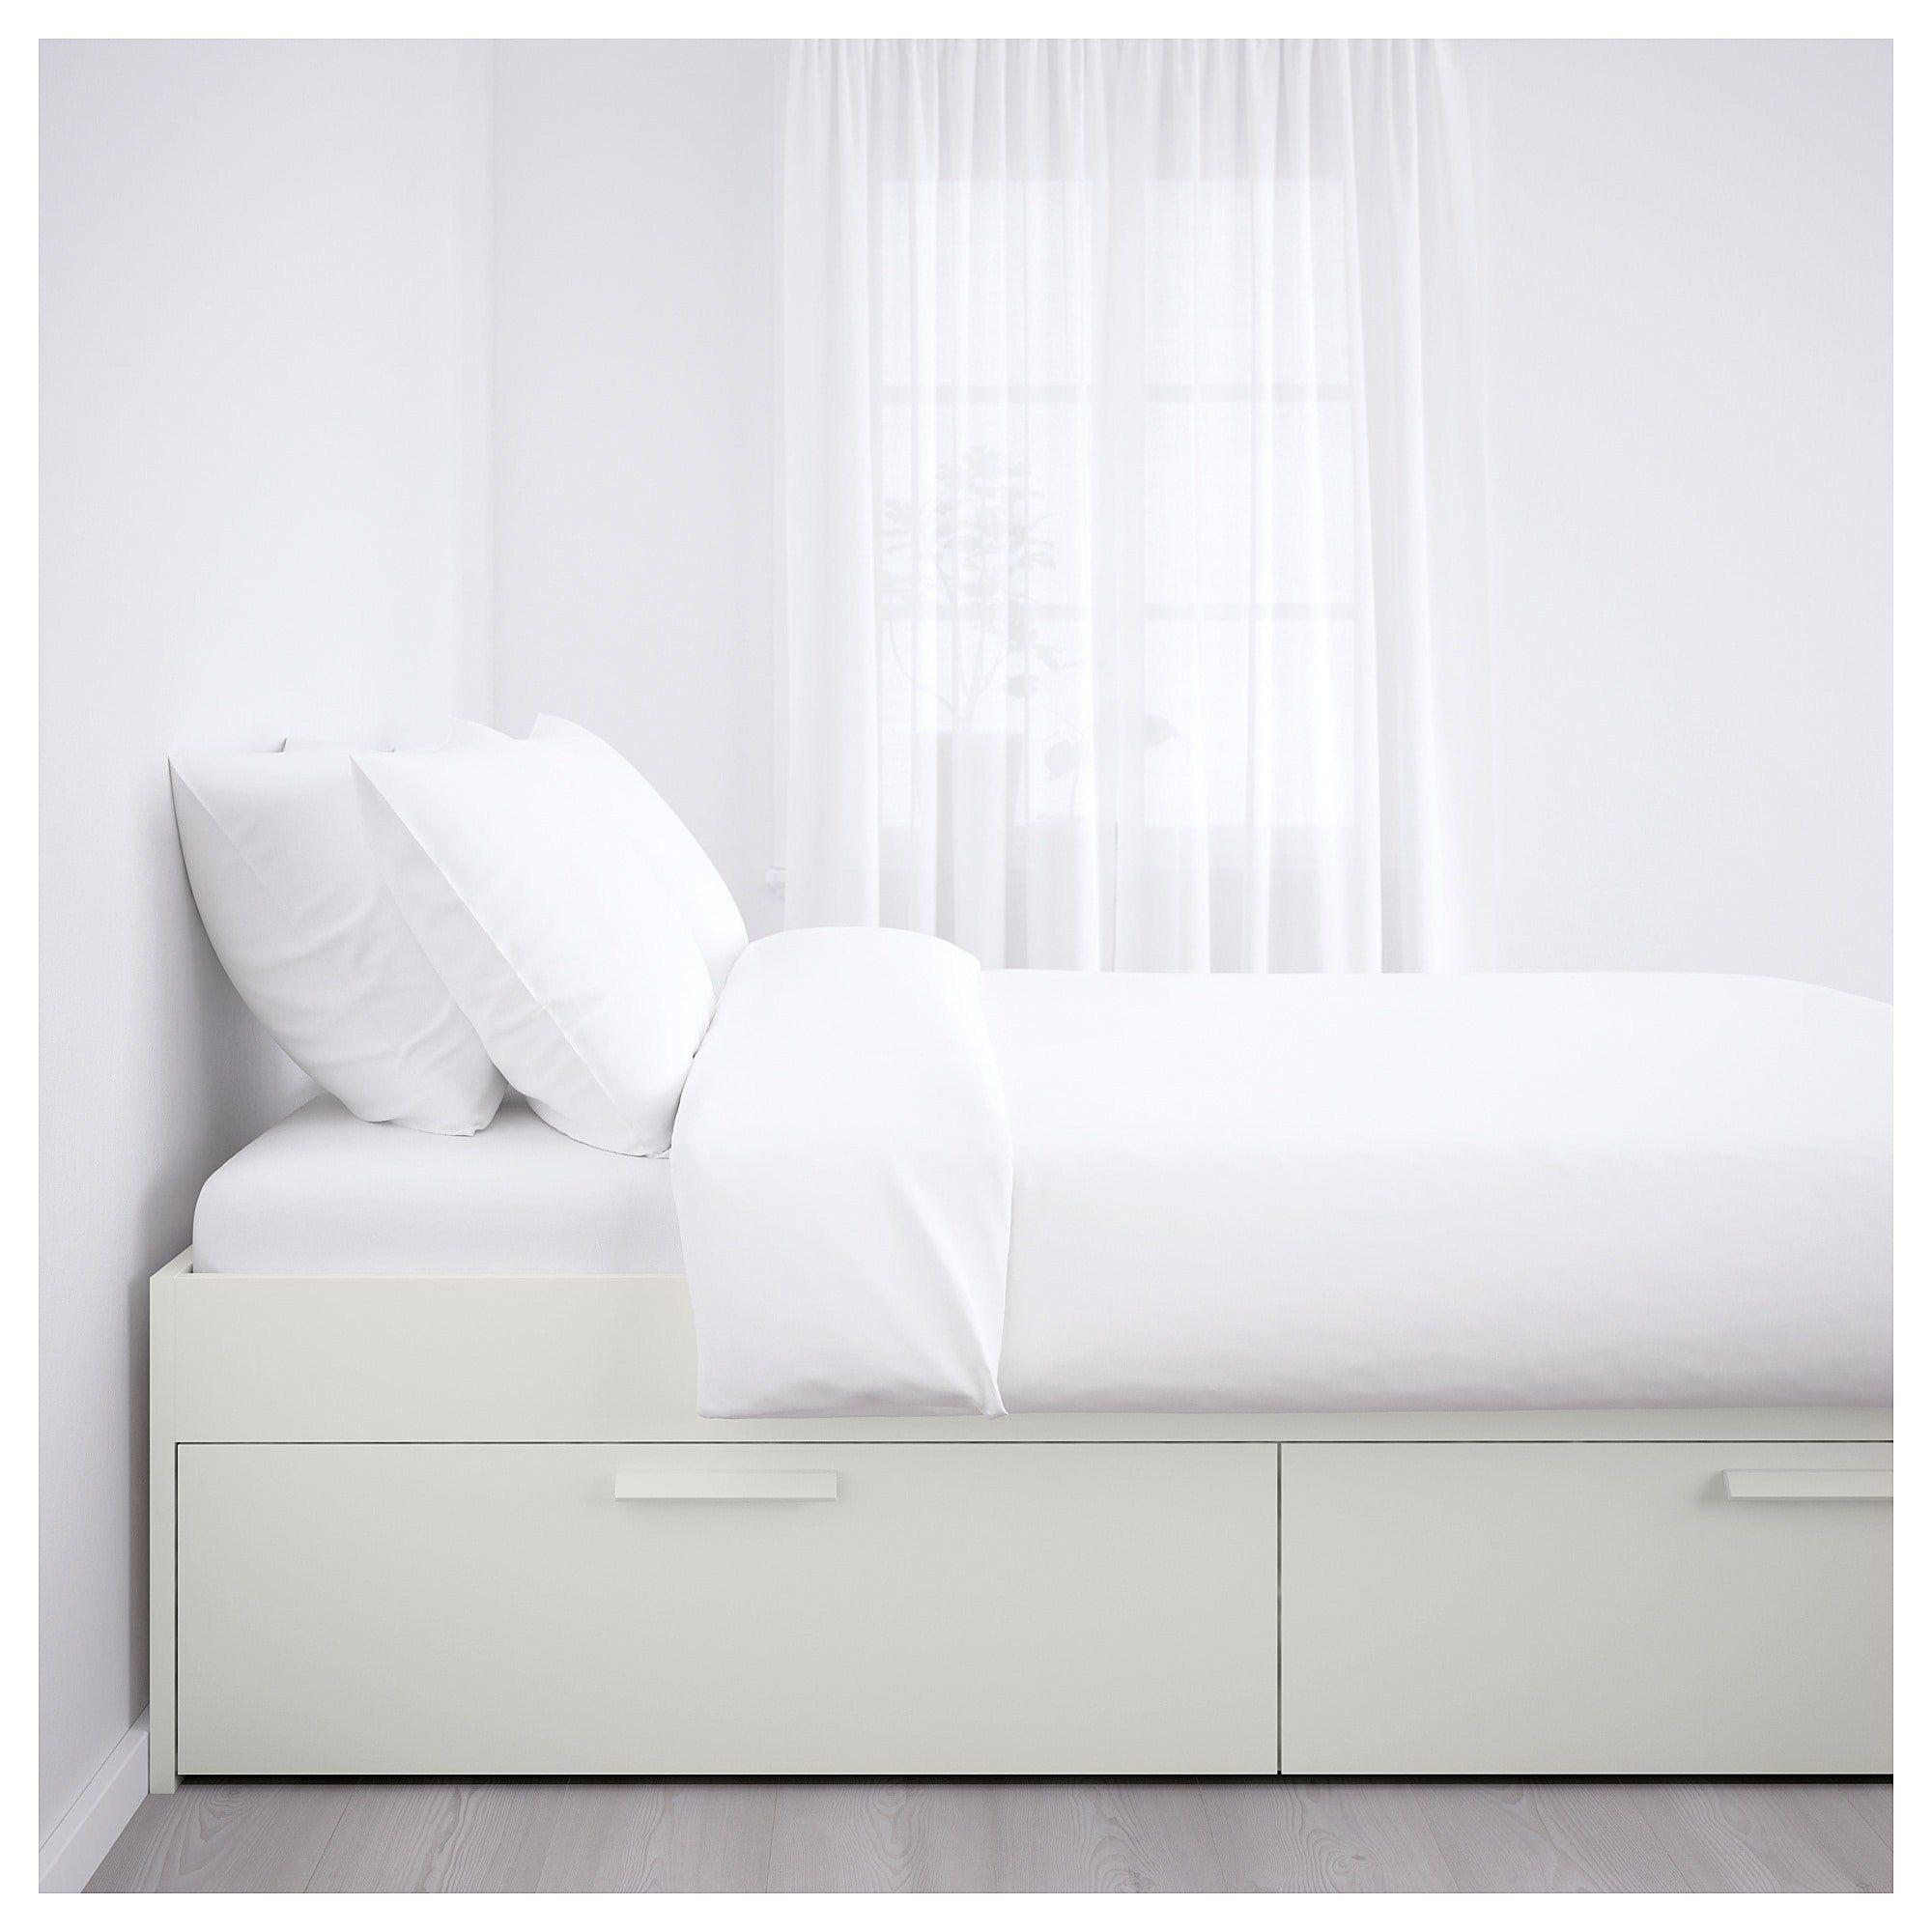 Lit 90×200 Avec Rangement Impressionnant Lit Gigogne Avec Rangement Ikea